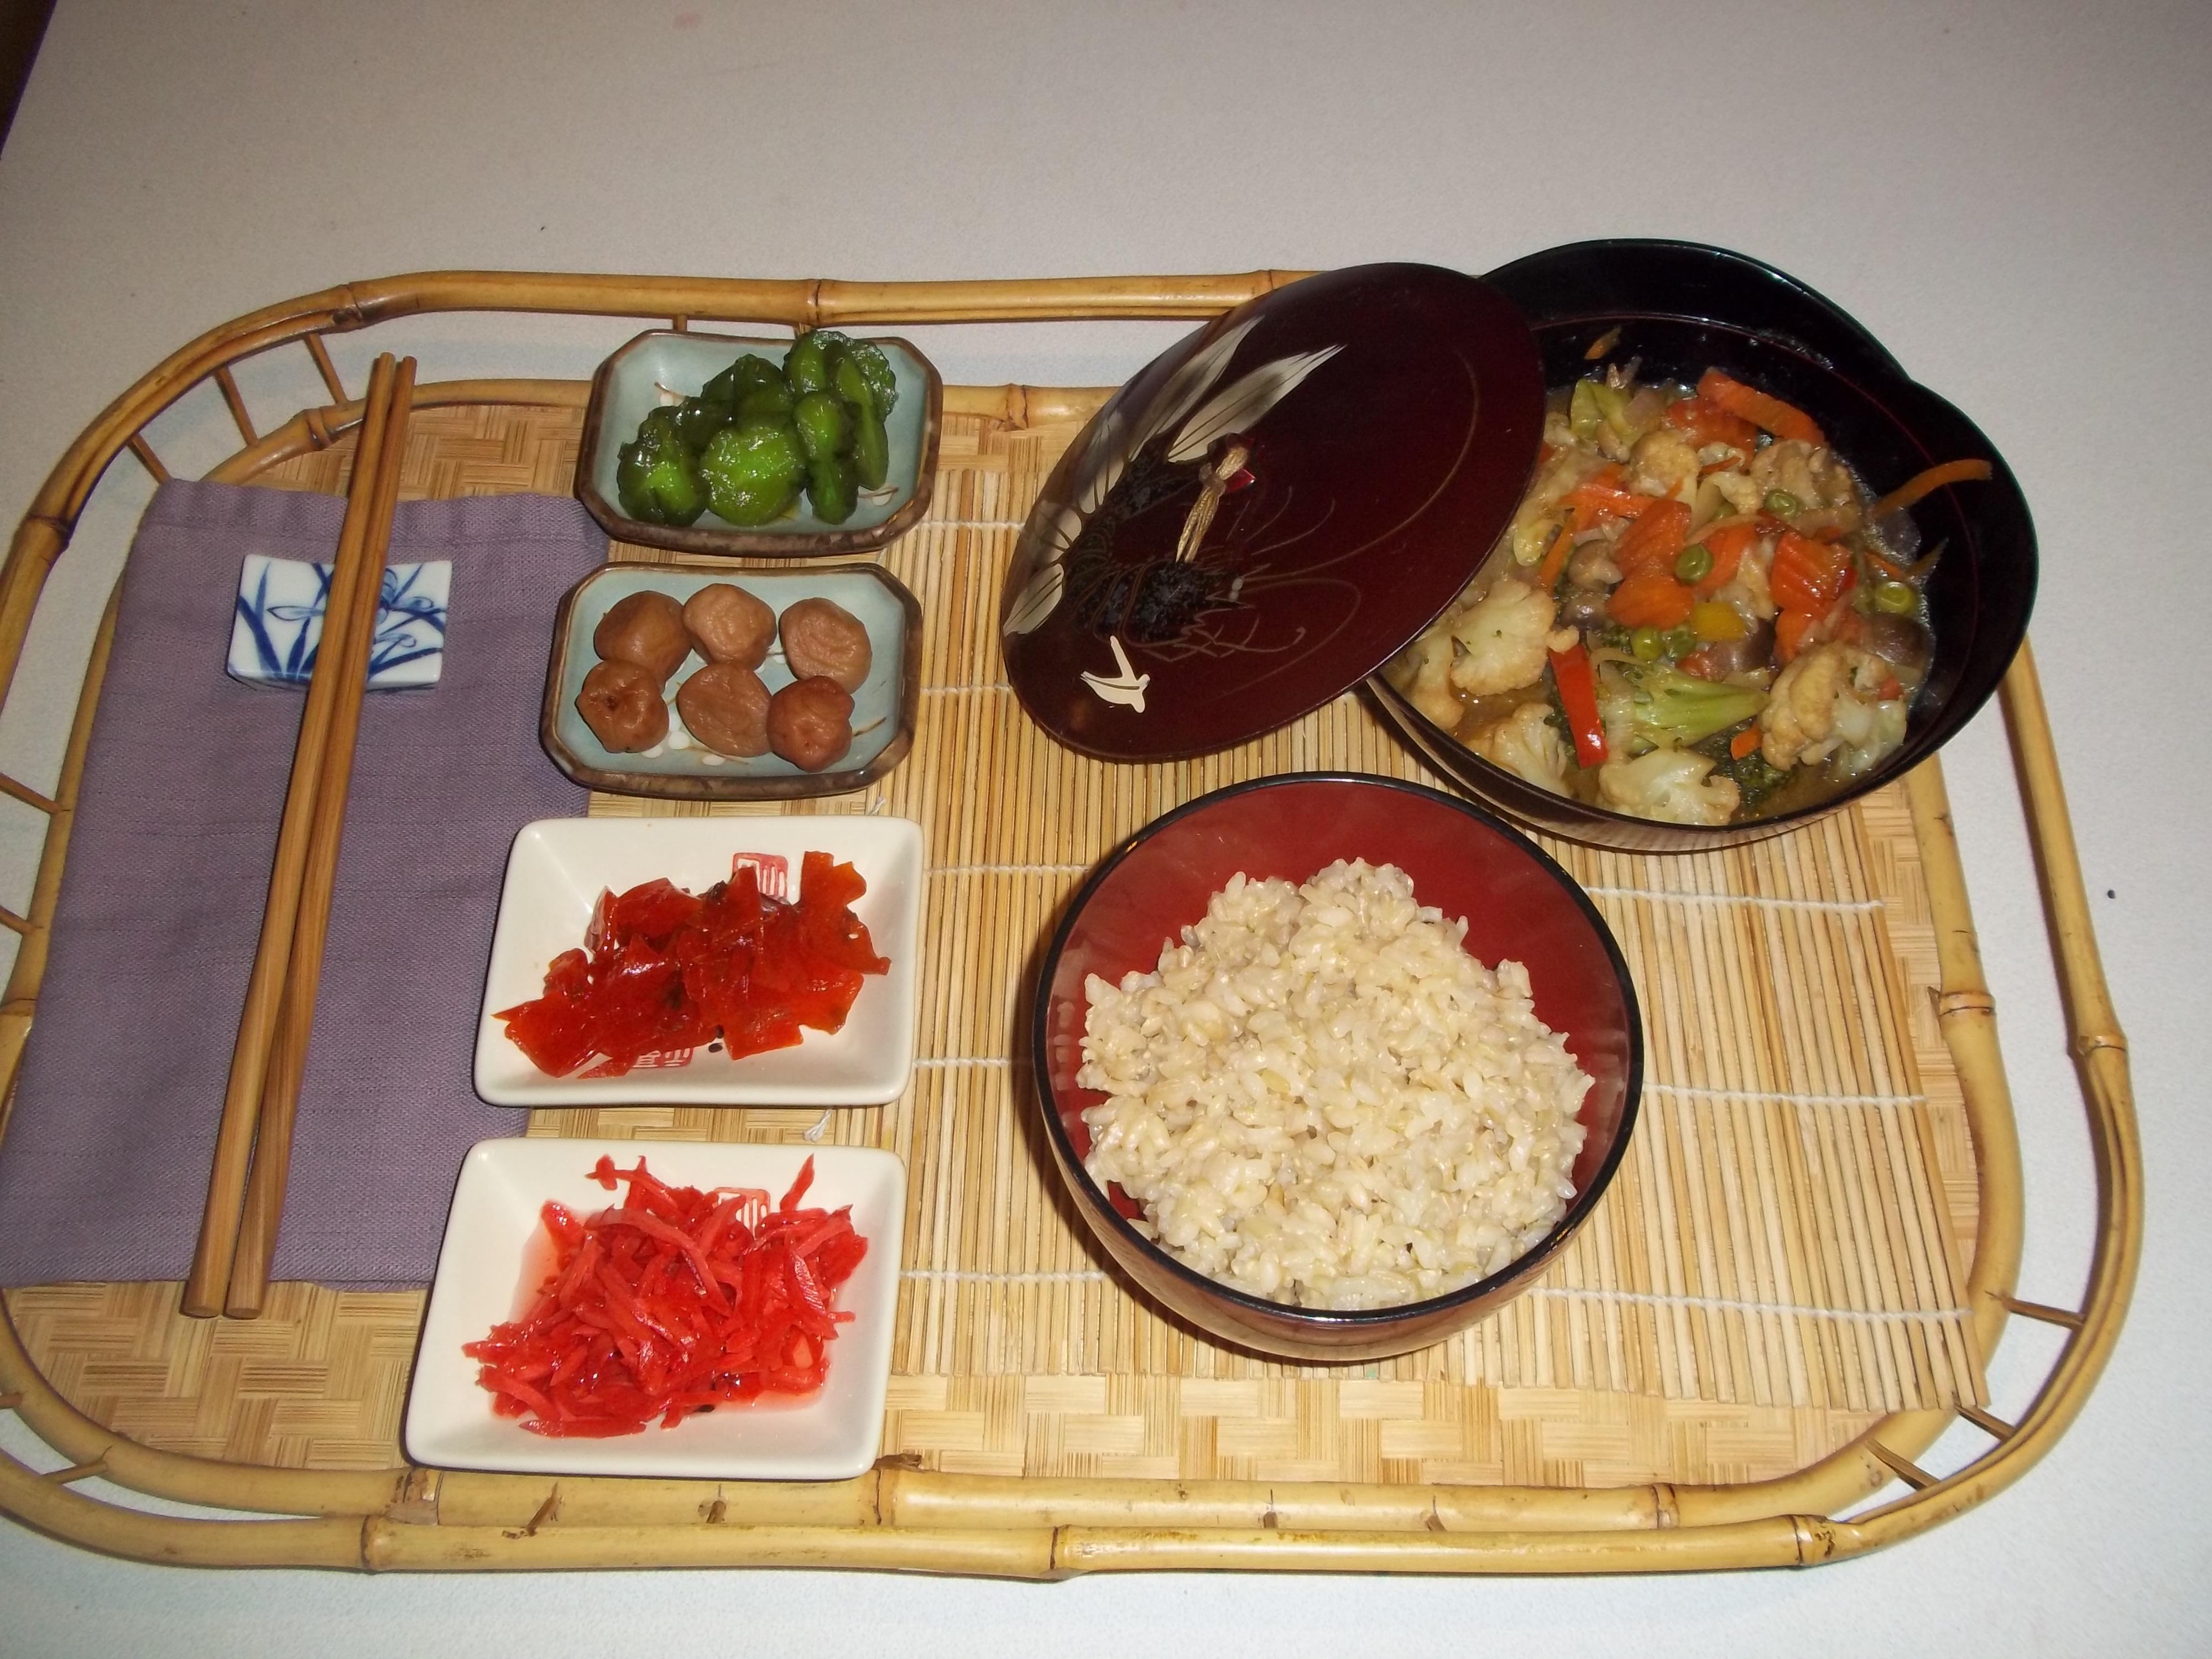 Food porn from shogun japan alica mckenna johnson - Shogun japanese cuisine ...